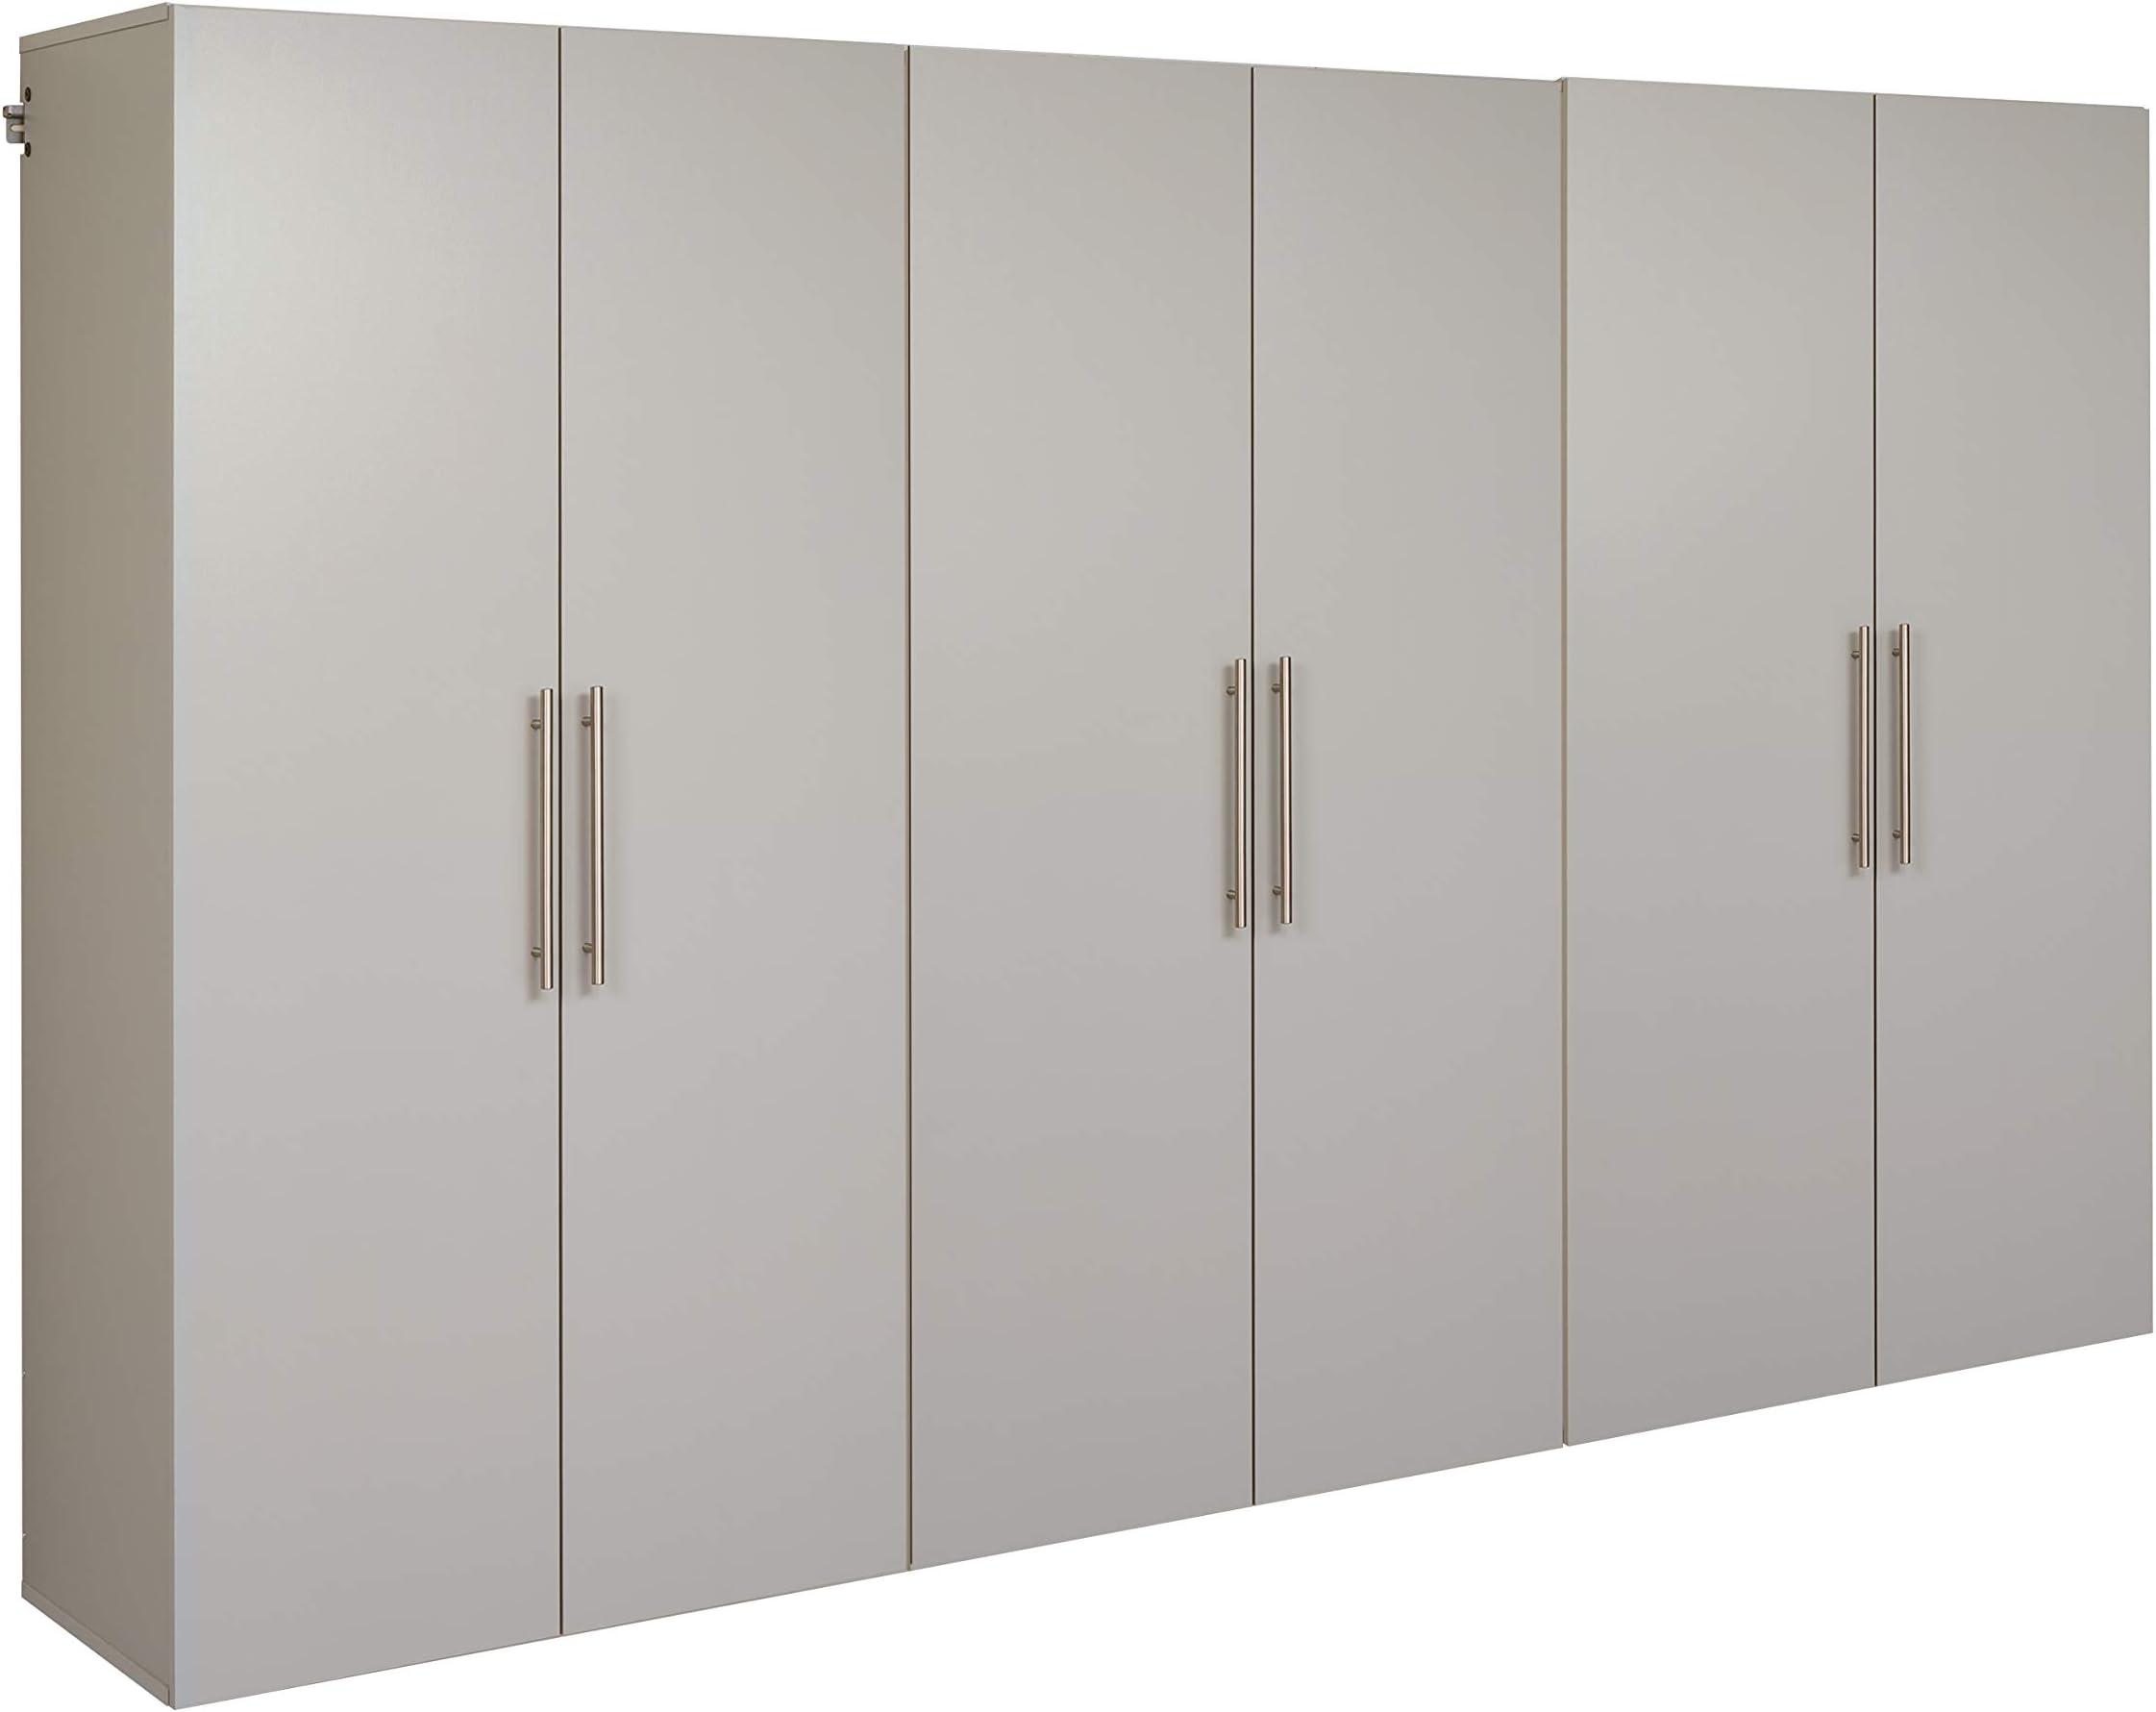 Prepac HangUps Storage Cabinet Set, E-3 pc, Light Gray